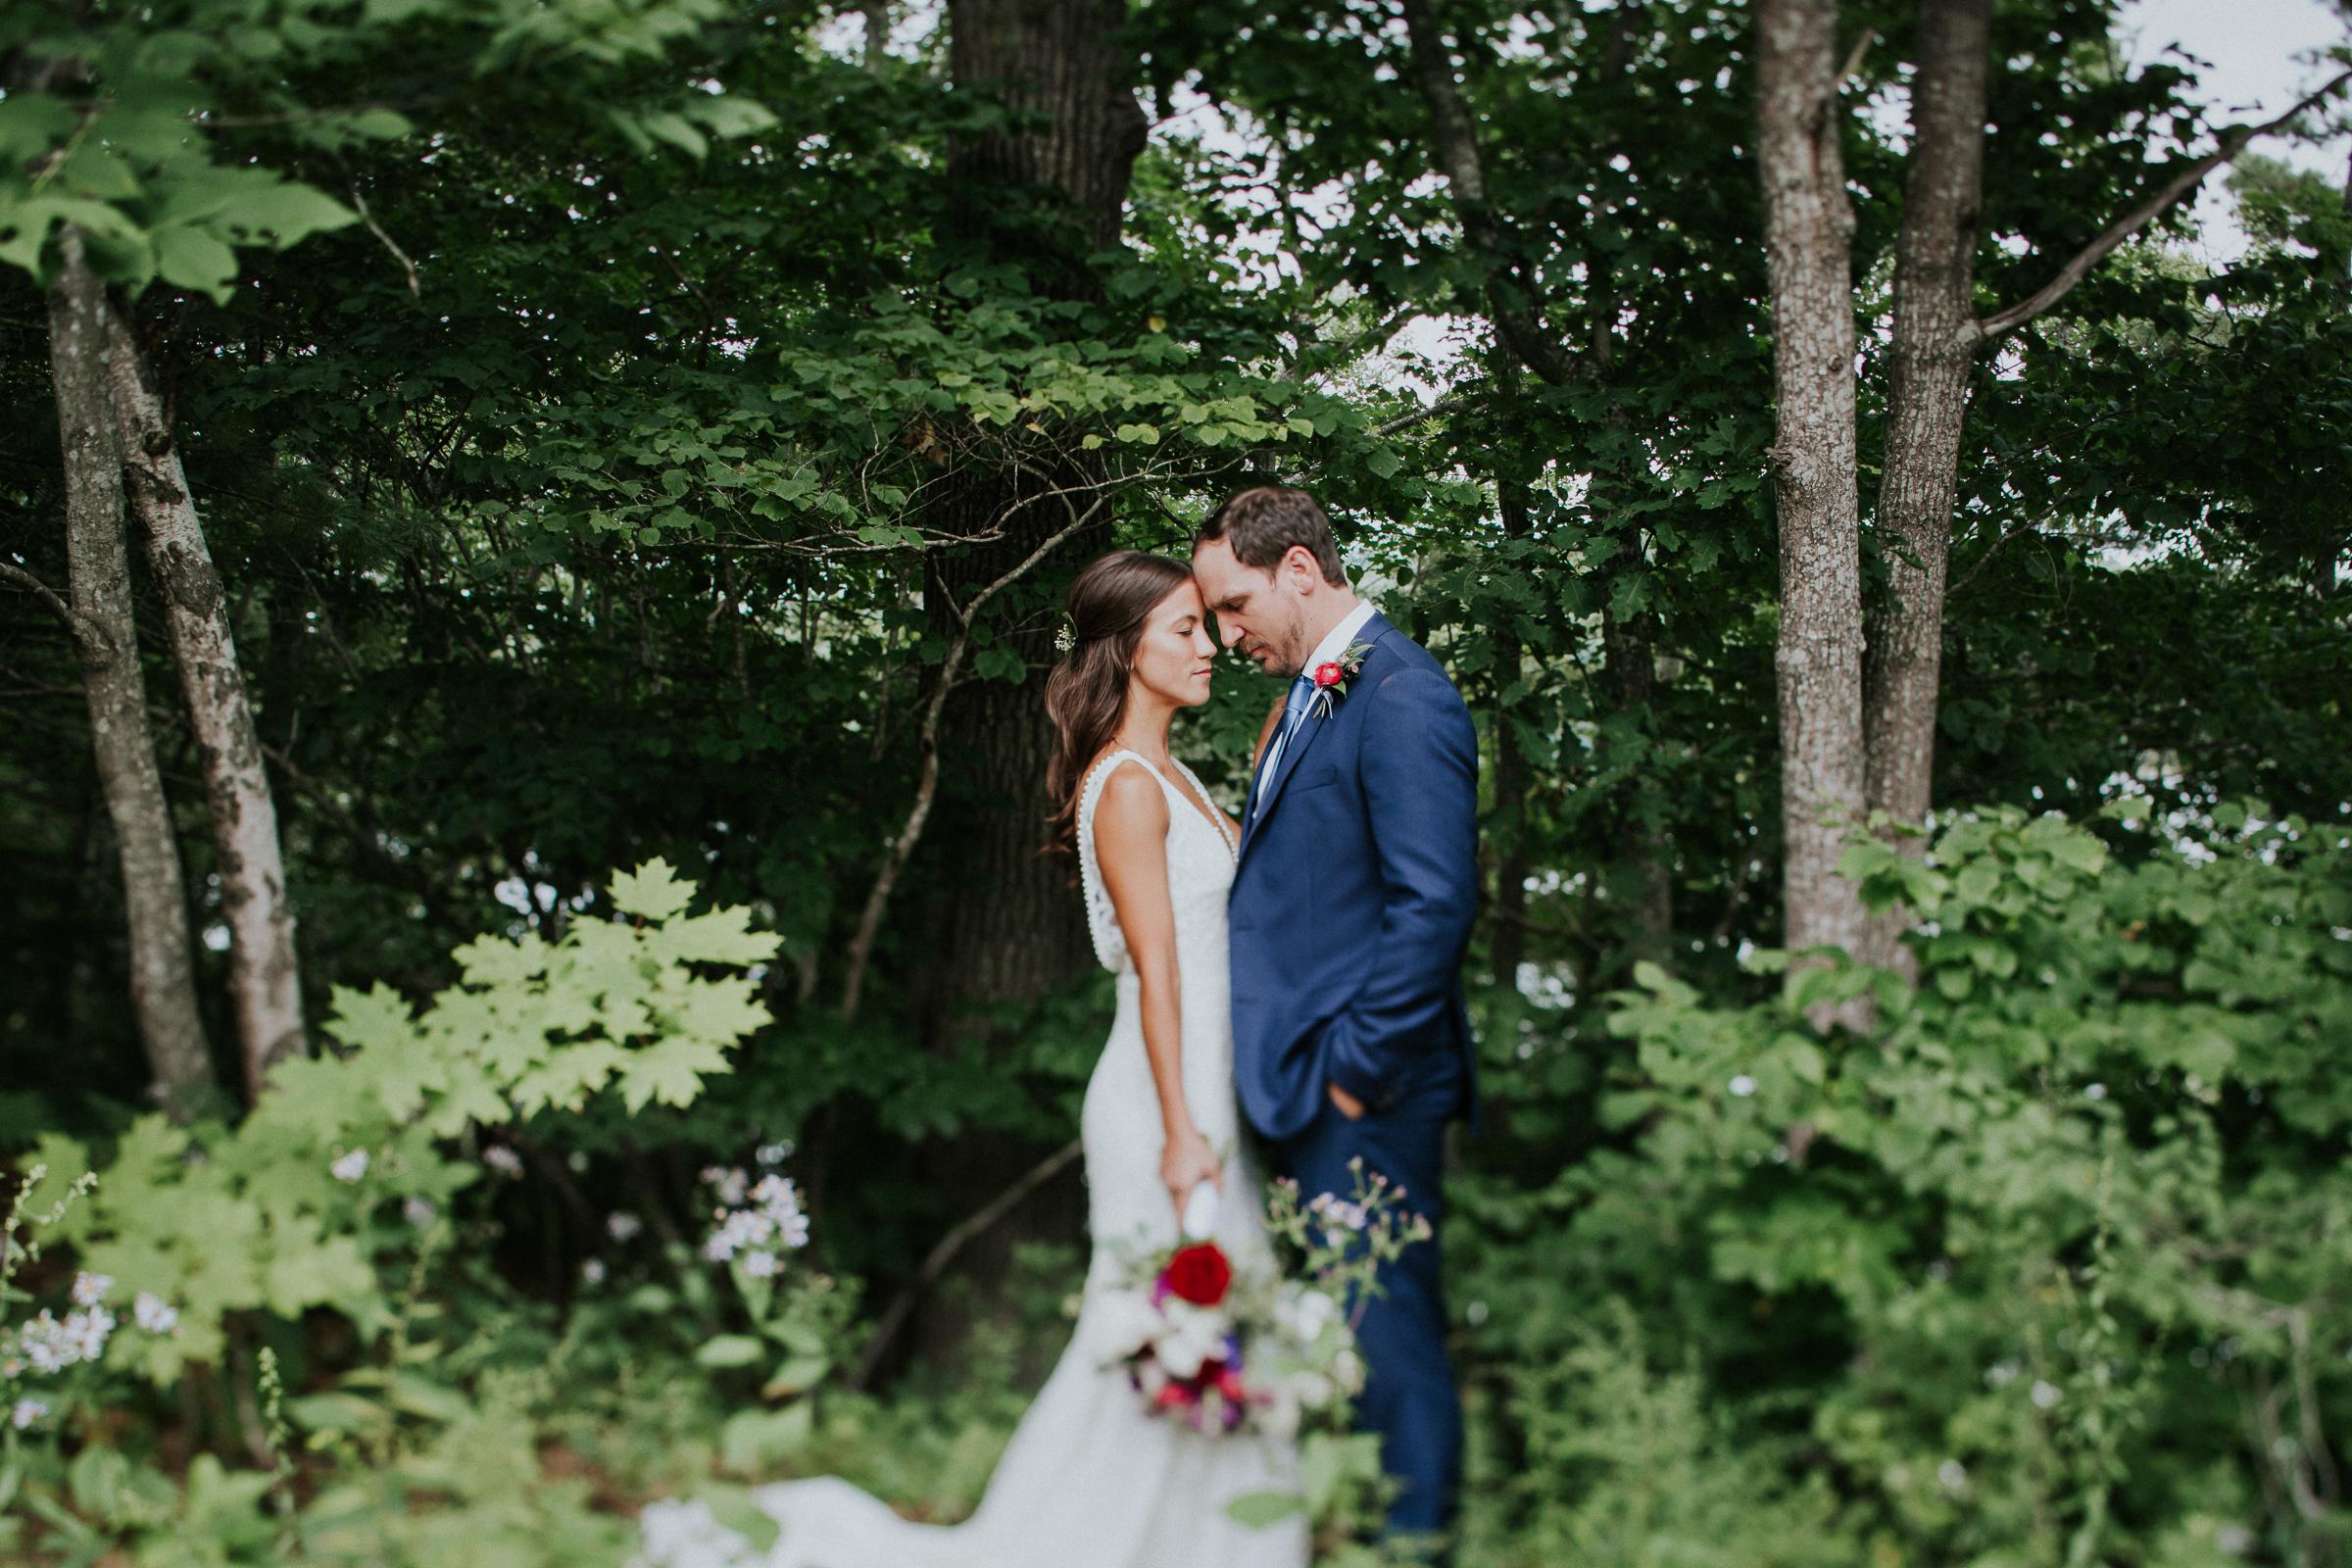 Marianmade-Farm-Wiscasset-Maine-Fine-Art-Documentary-Wedding-Photographer-Elvira-Kalviste-Photography-47.jpg